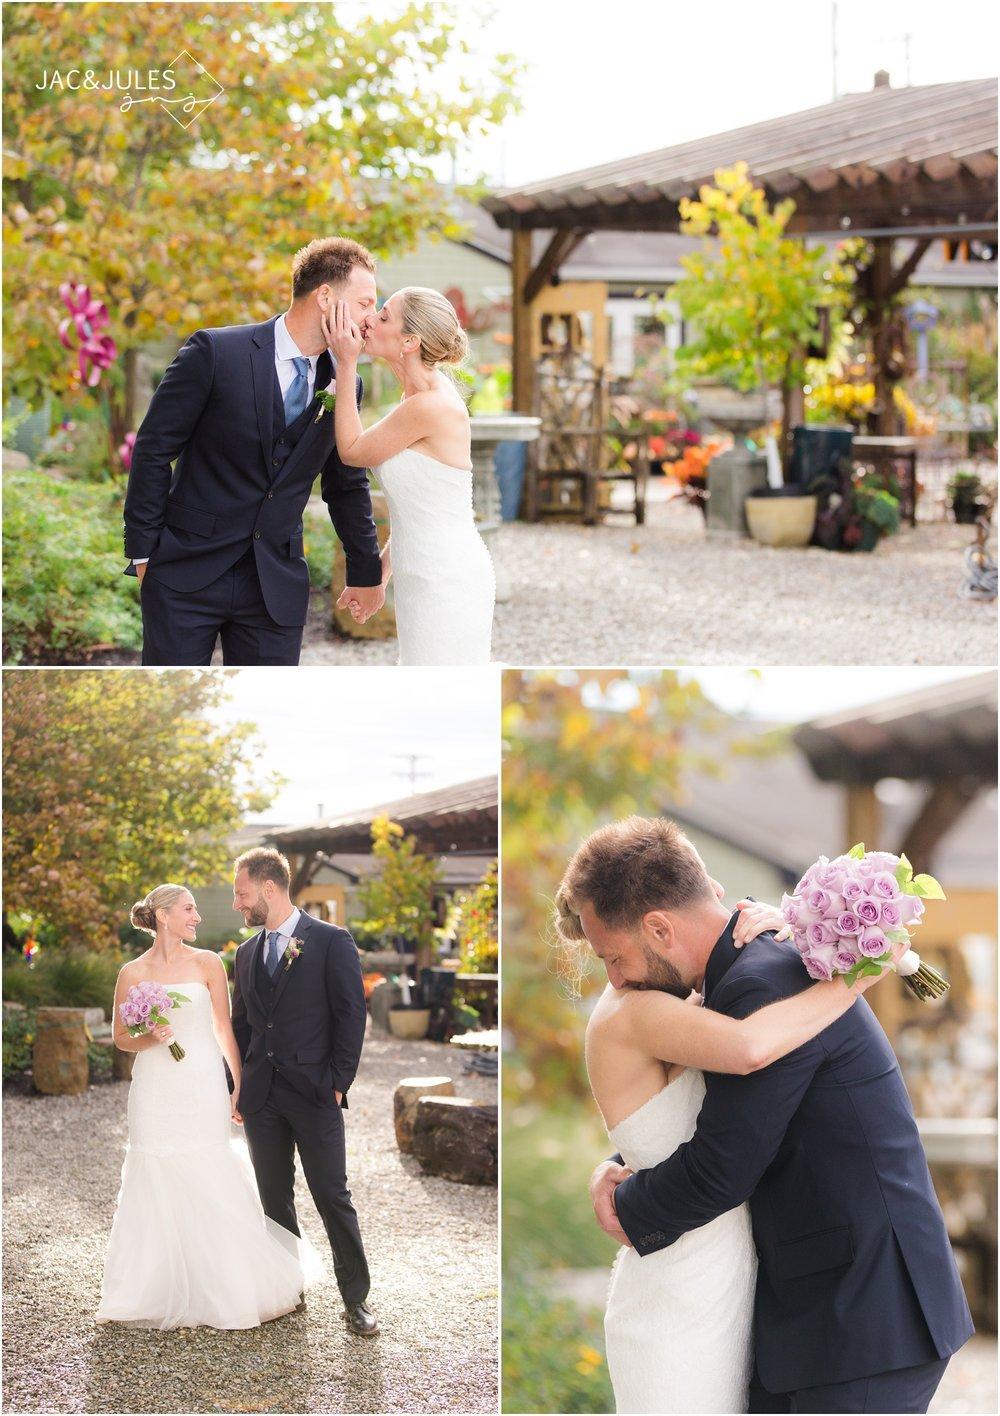 fun garden wedding photos of bride and groom in freehold, nj.